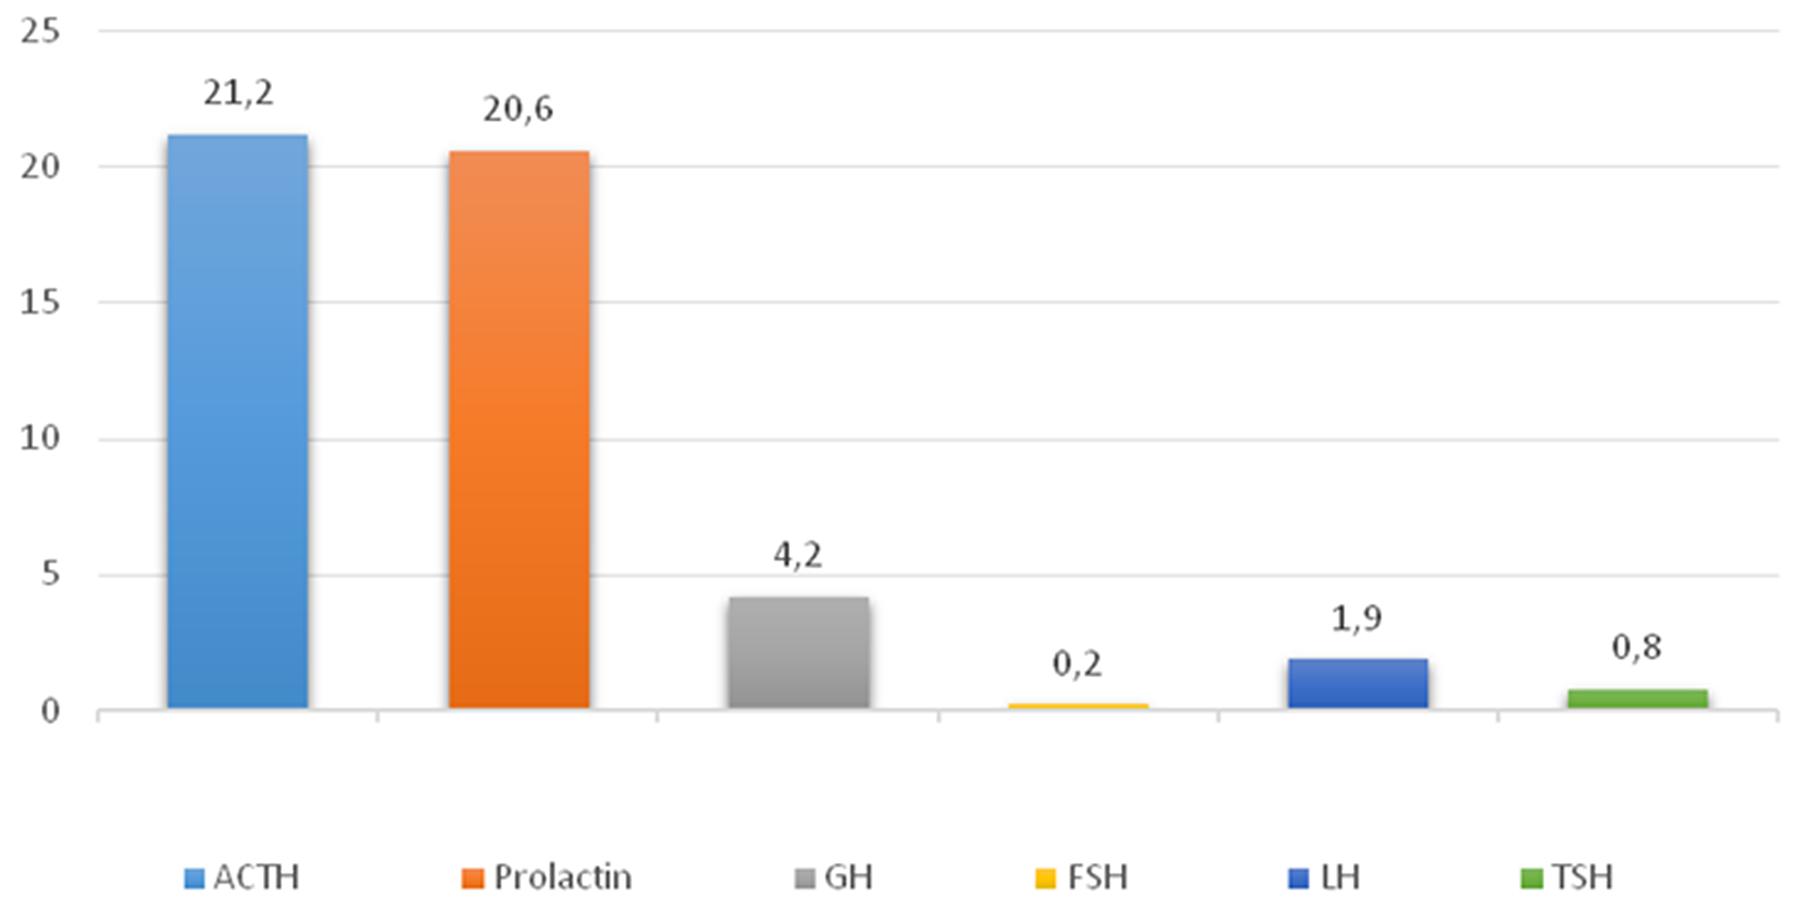 Average hormone expression values in plurihormonal pituitary adenomas.